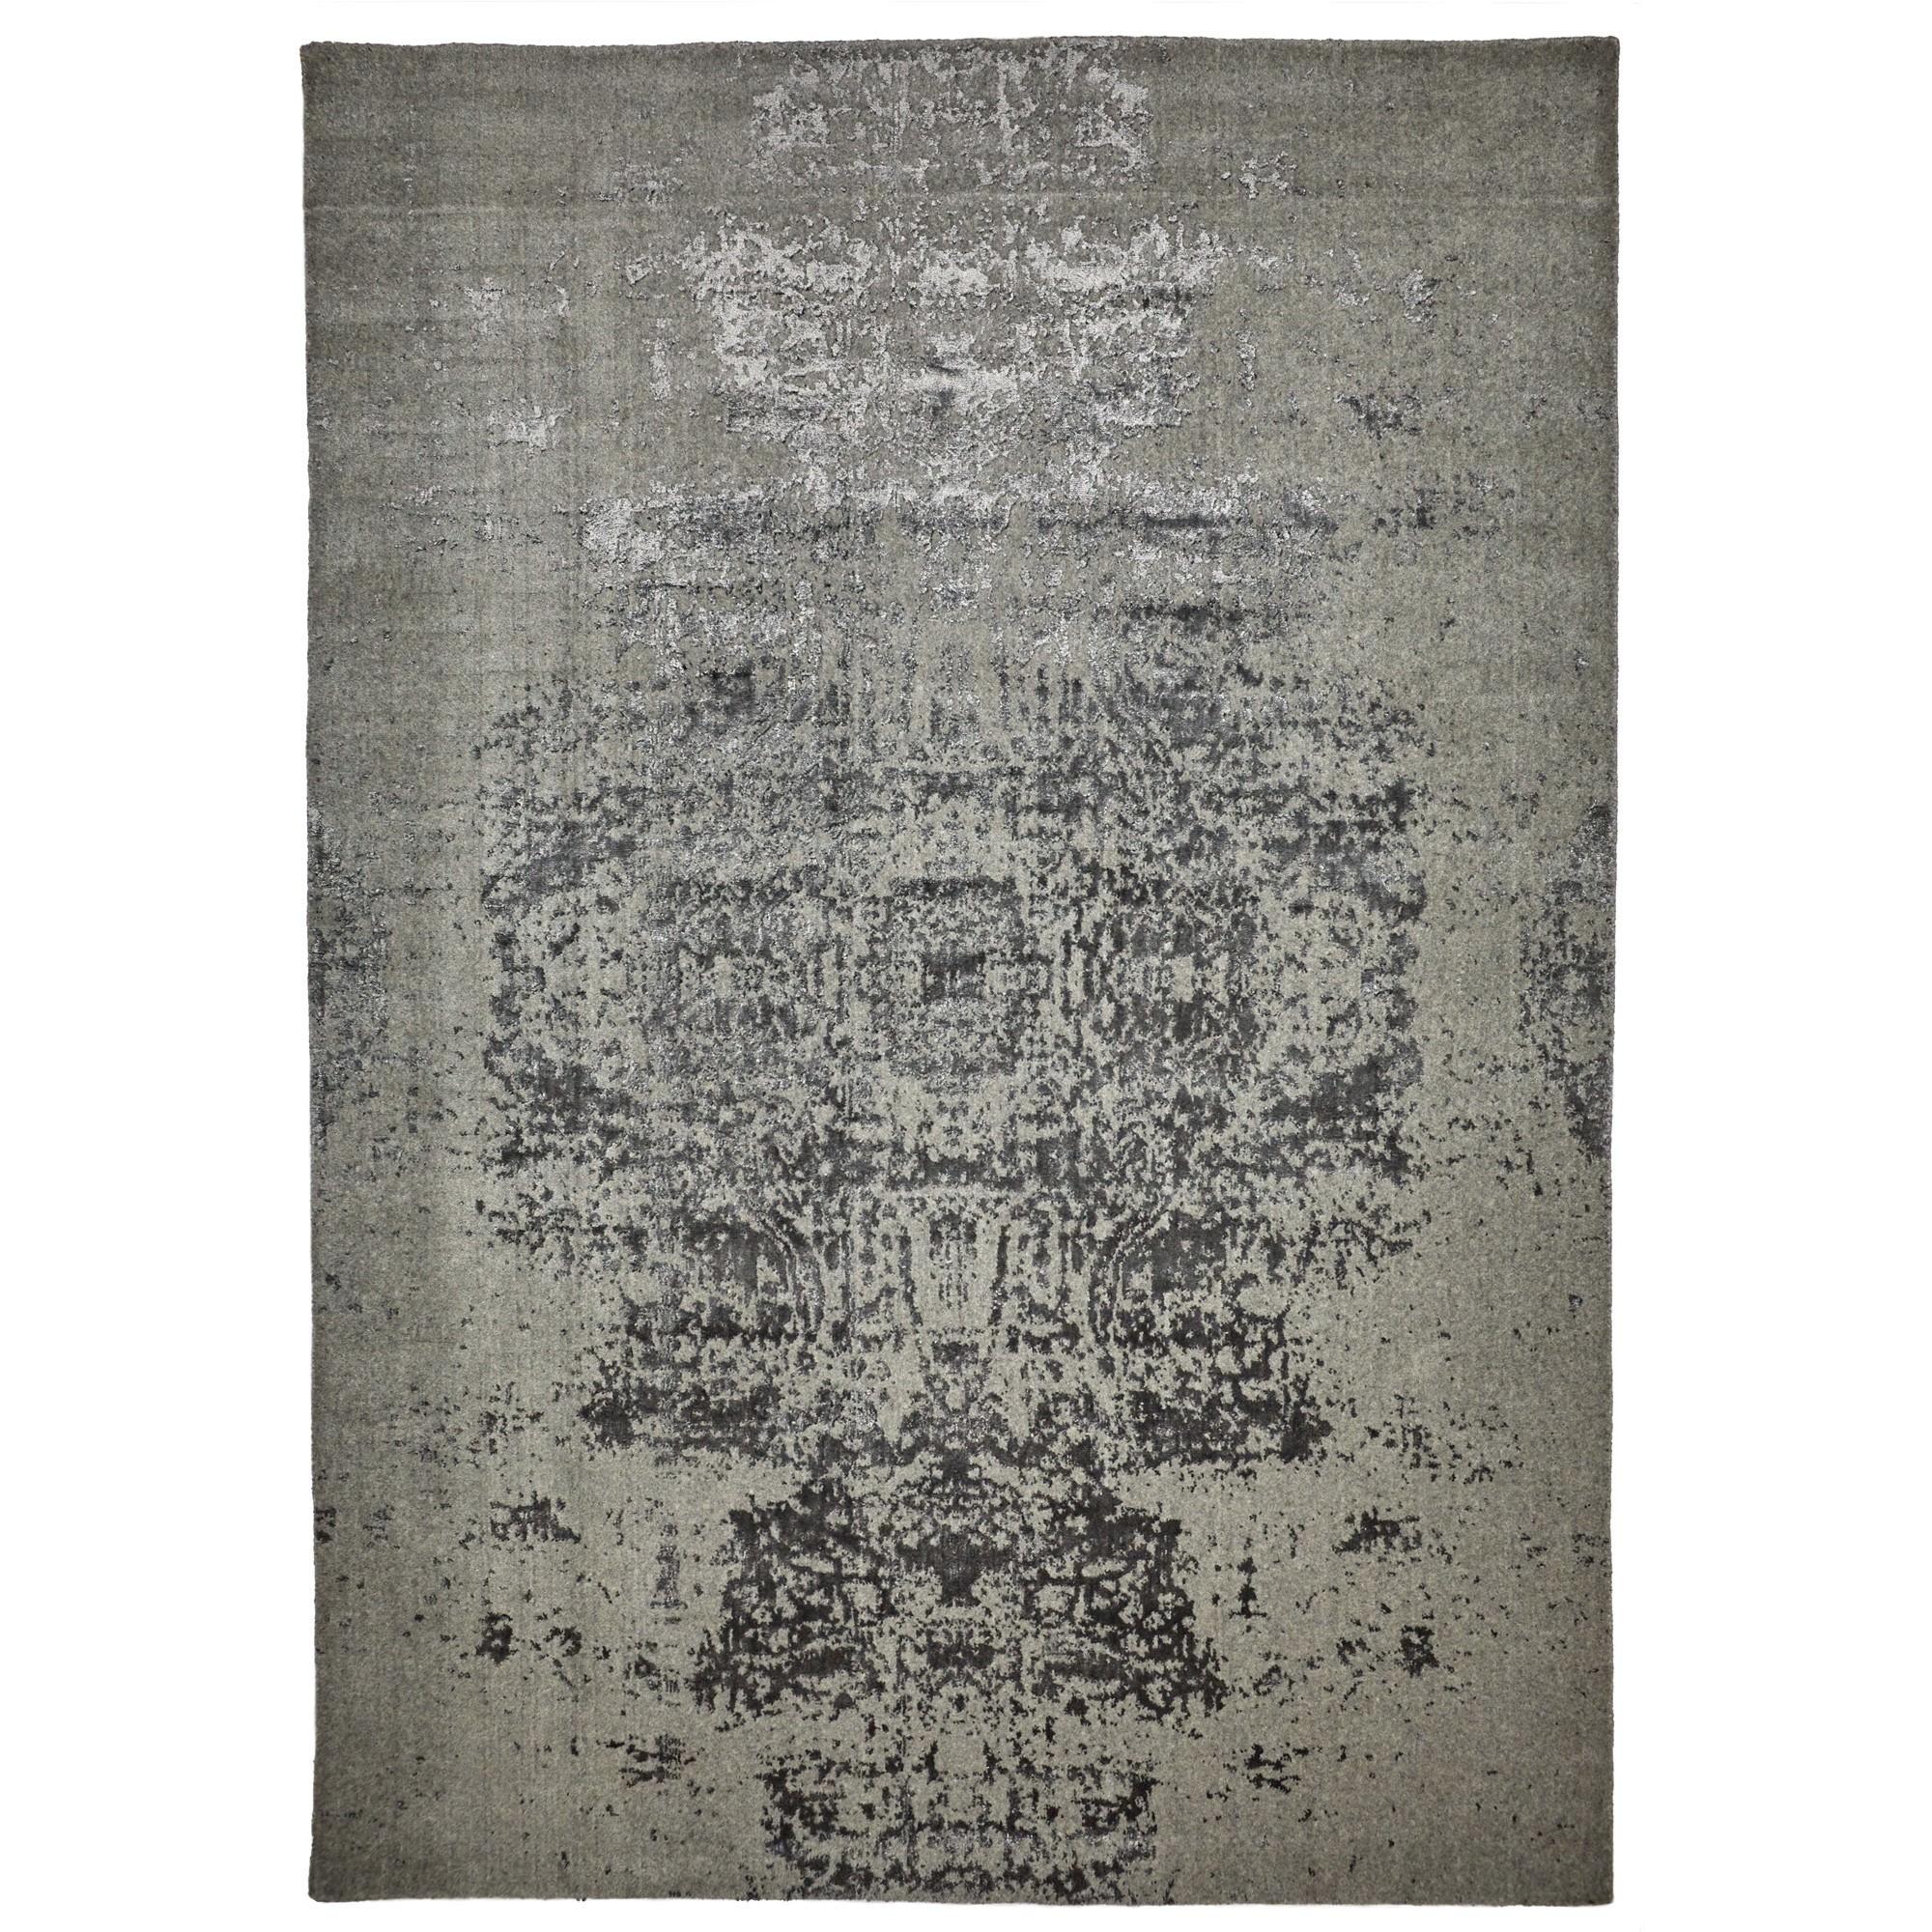 Vienna No.047 Handmade Wool Transitional Rug, 225x155cm, Grey